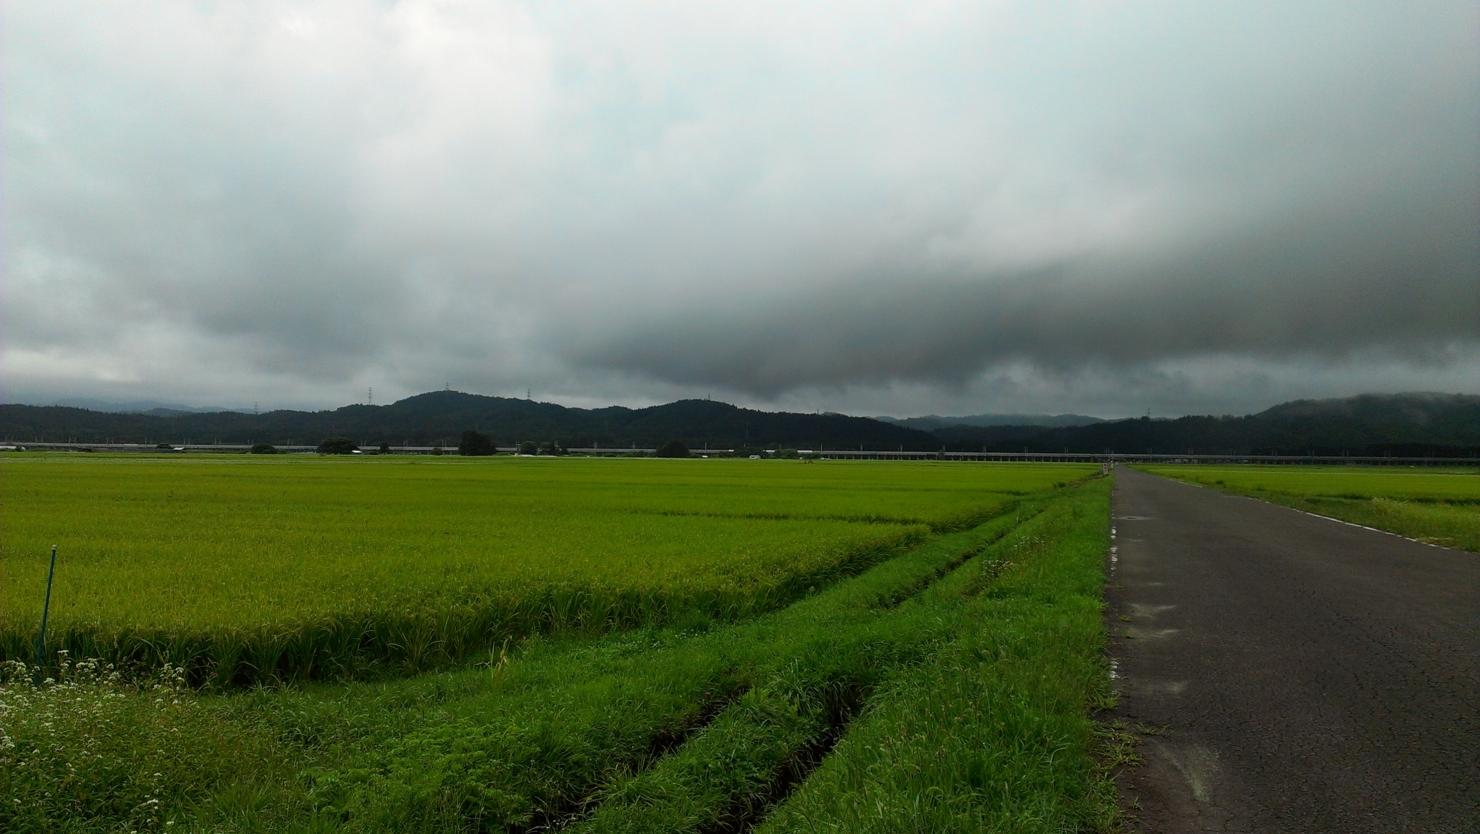 f:id:ToshUeno:20130901110002j:plain